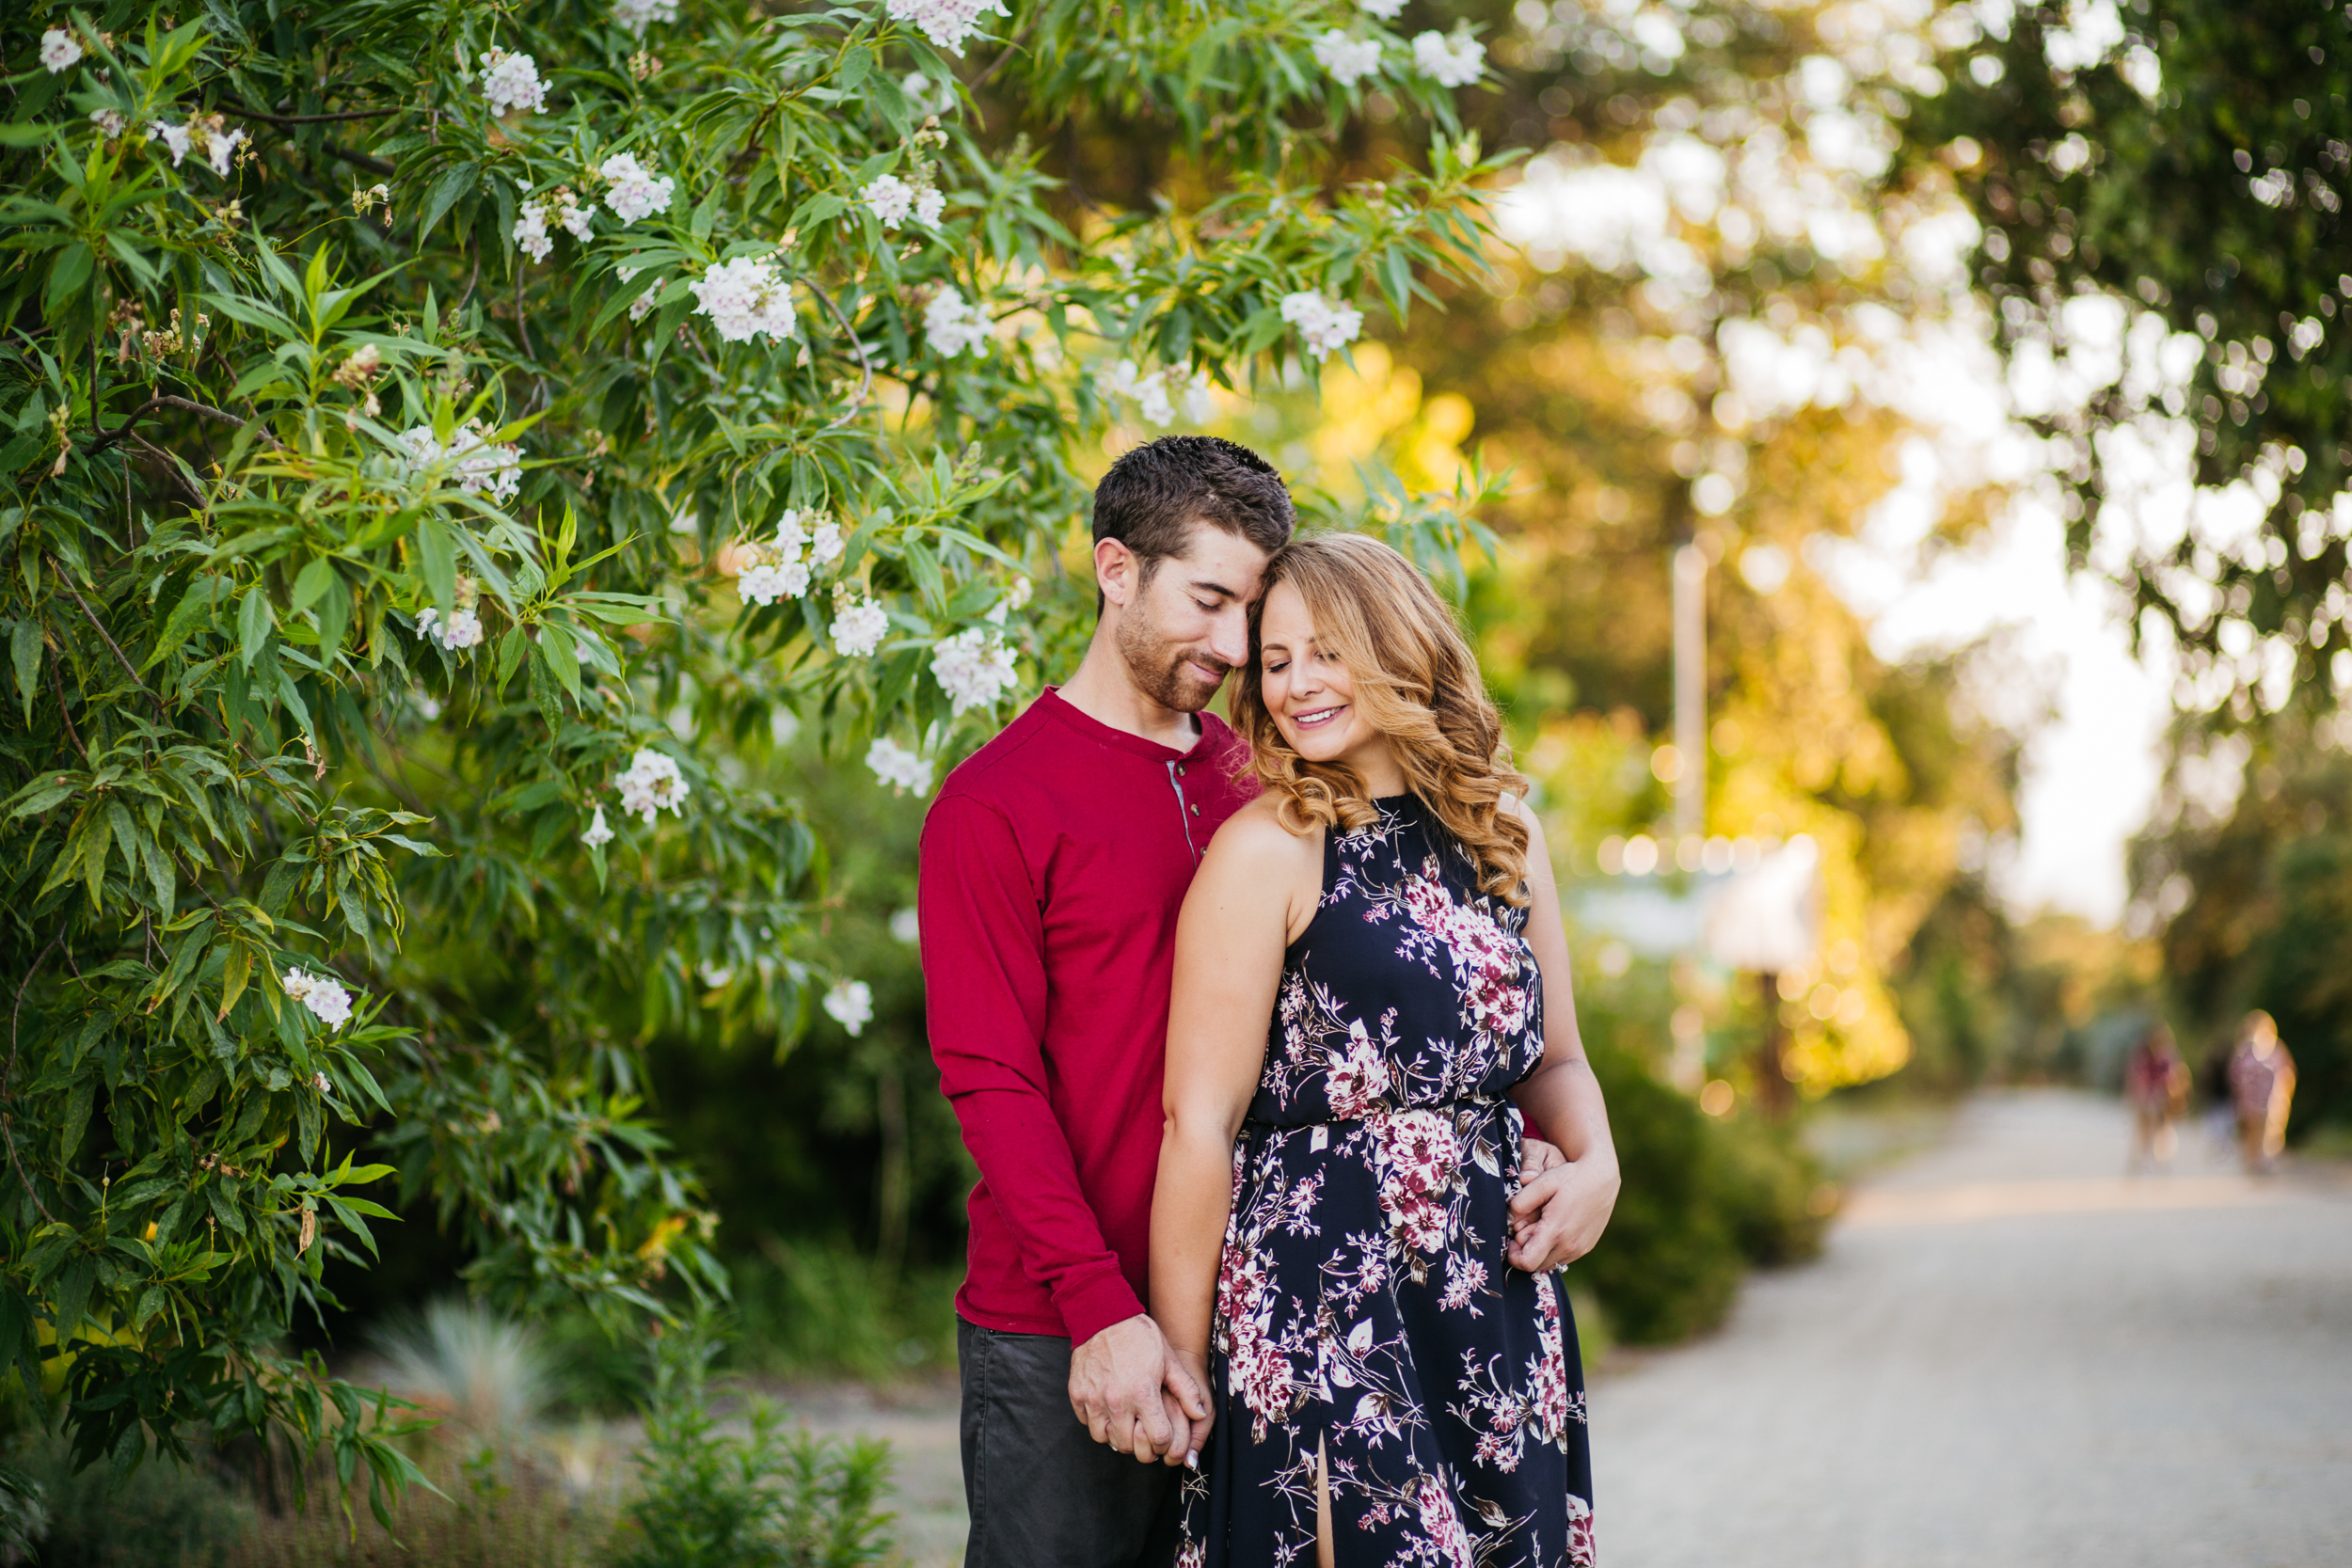 Engagement Photos-Redding-Turtle Bay-Sundial Bridge-Ranalla Photo & Films-Wedding Photography-28.jpg